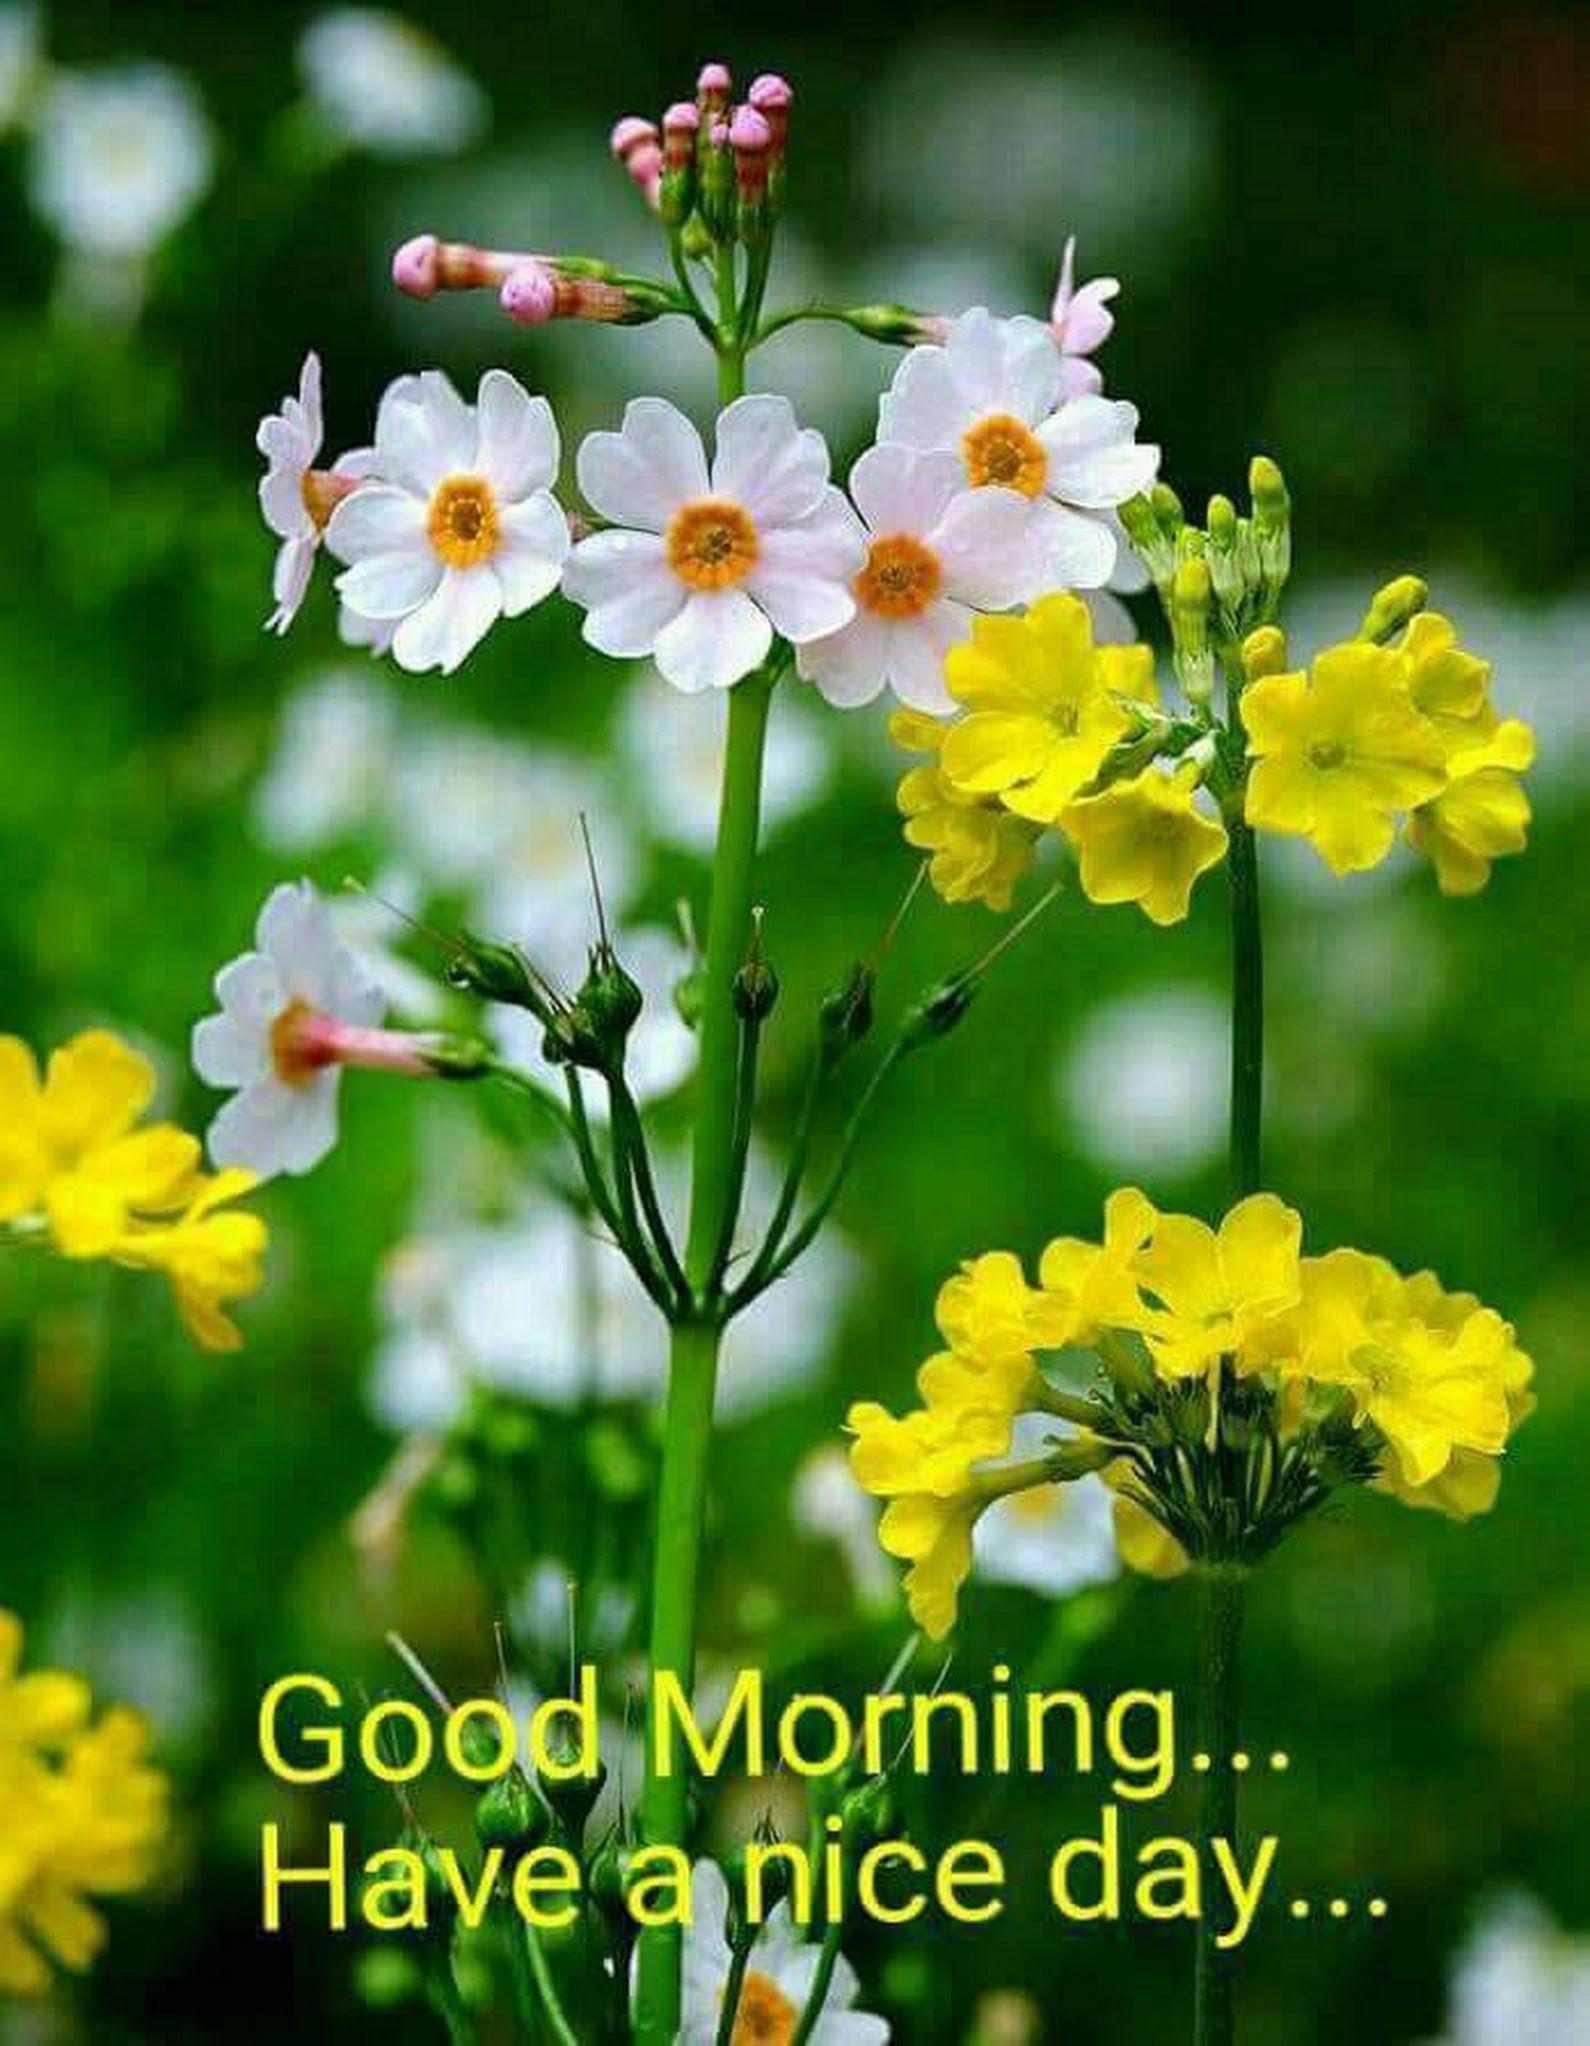 Manohar Upadhyay Google Pinterest Google Morning